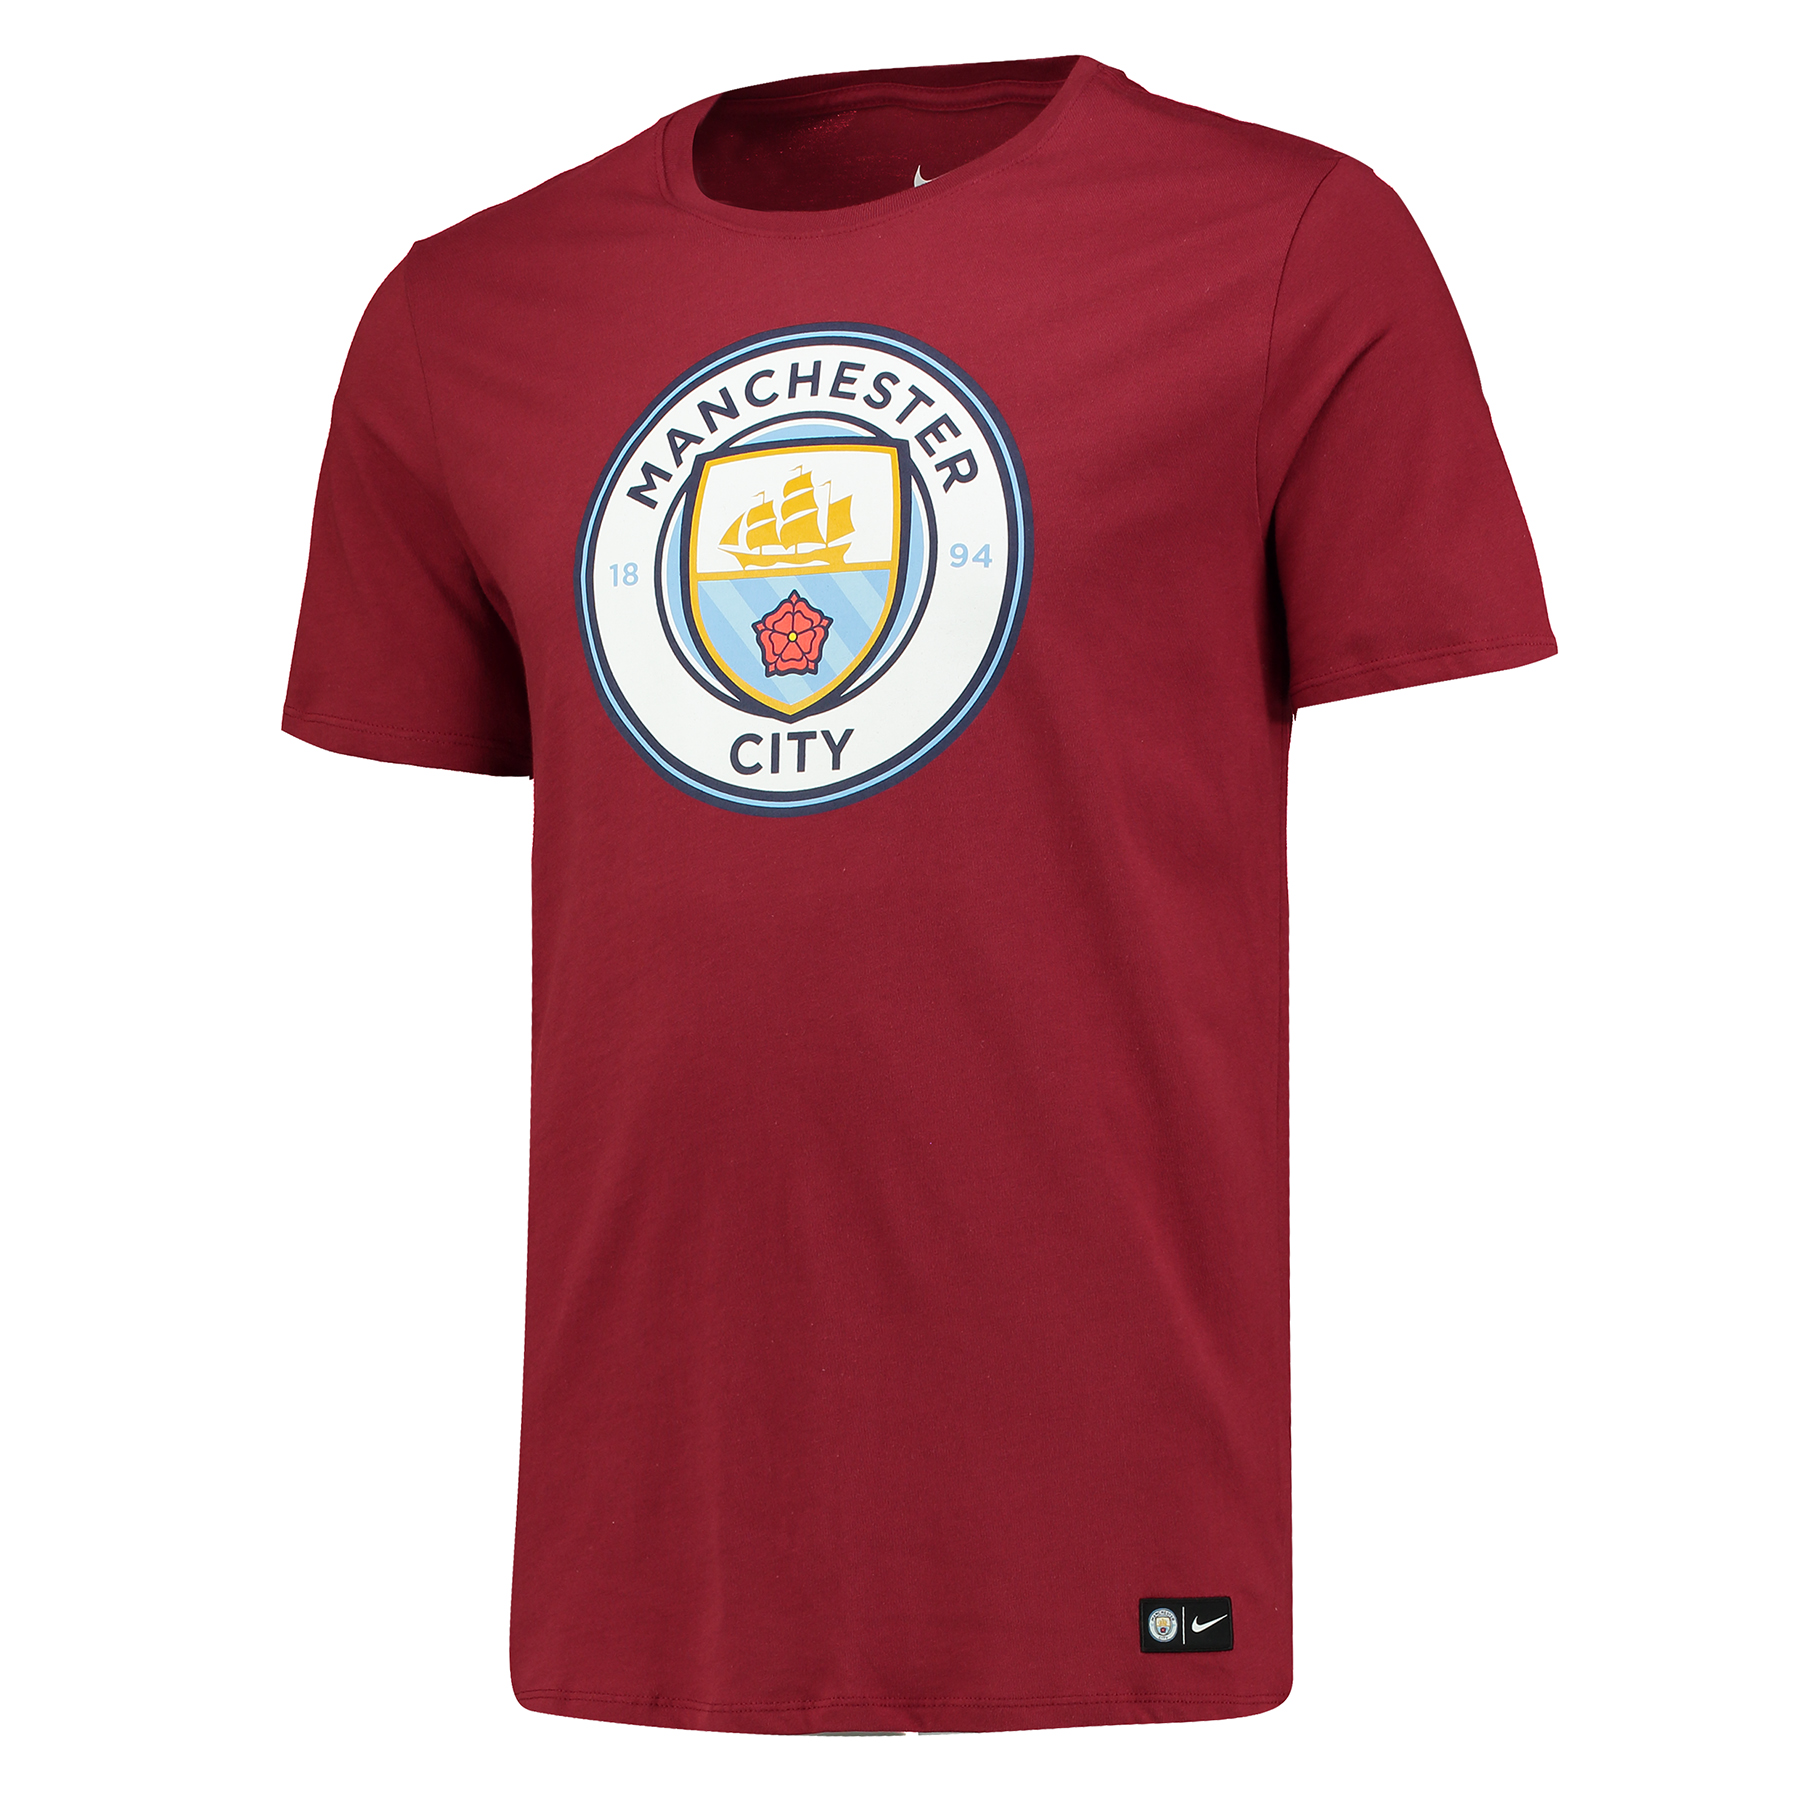 Manchester City Crest T-Shirt - Maroon - Kids